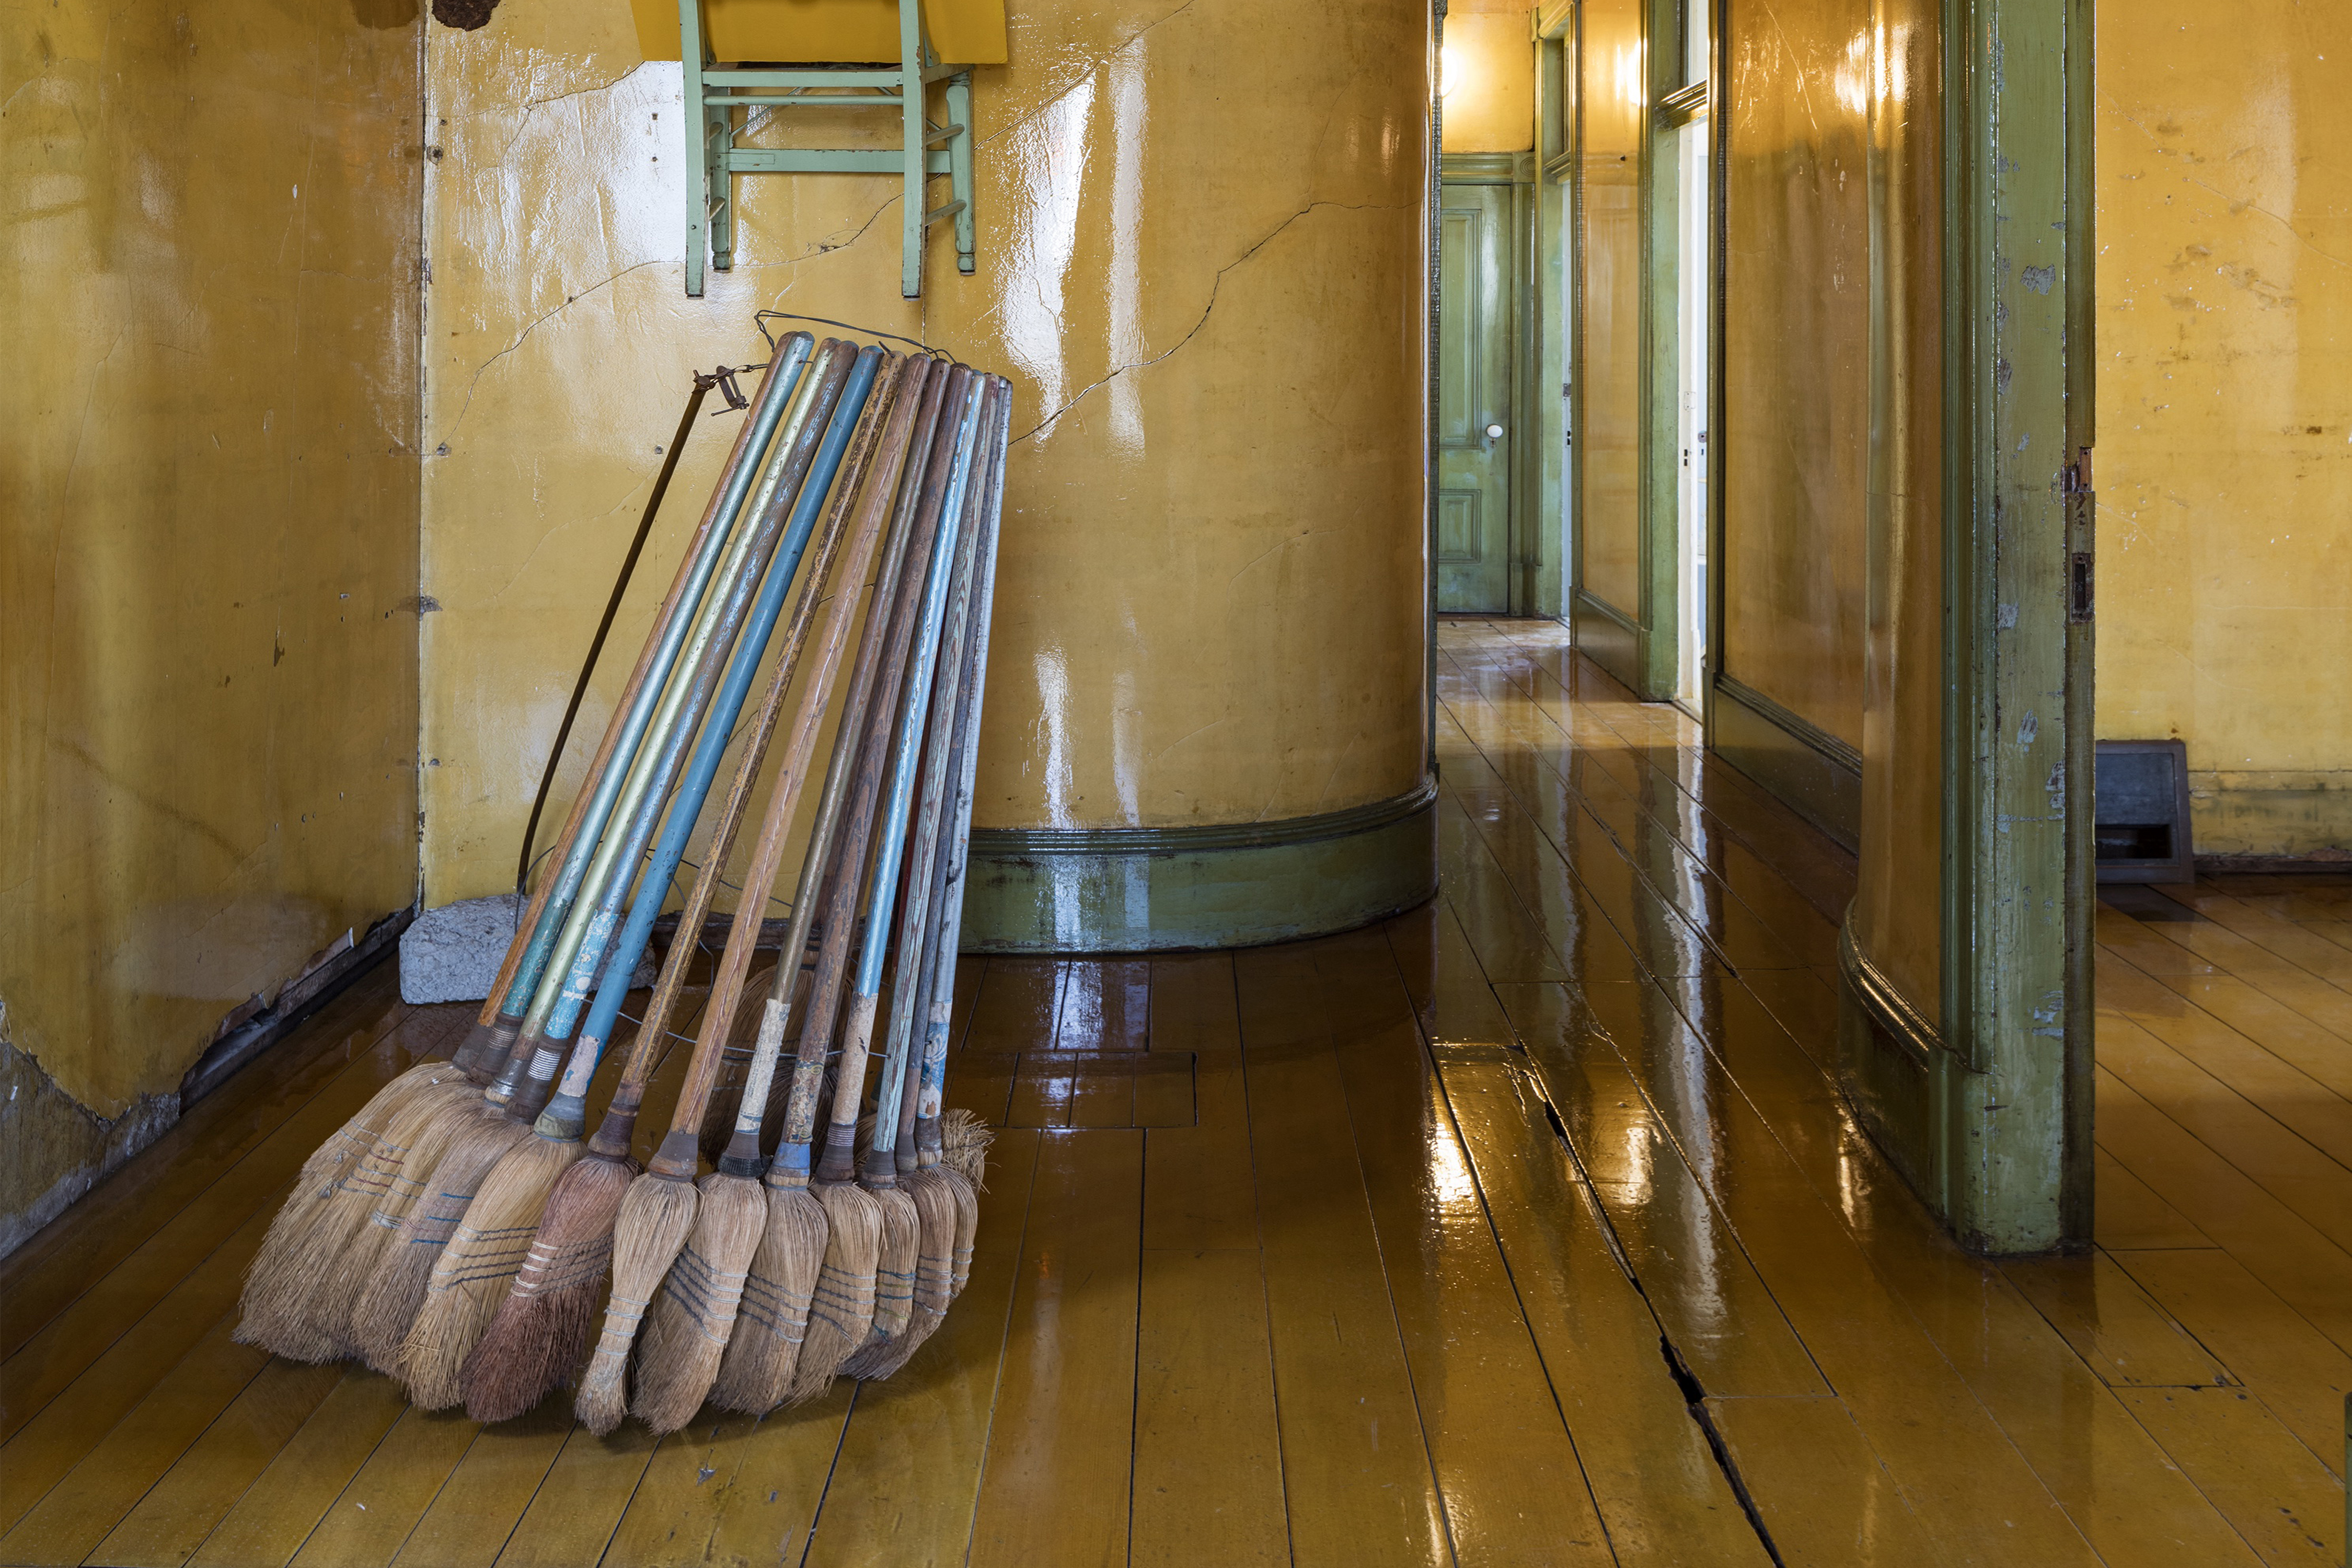 Web Home Brooms final  8.2016 500 Capp St_2nd floor hallway and stairs_#04_Nov 5th__©Henrik Kam 2015_ copy-2